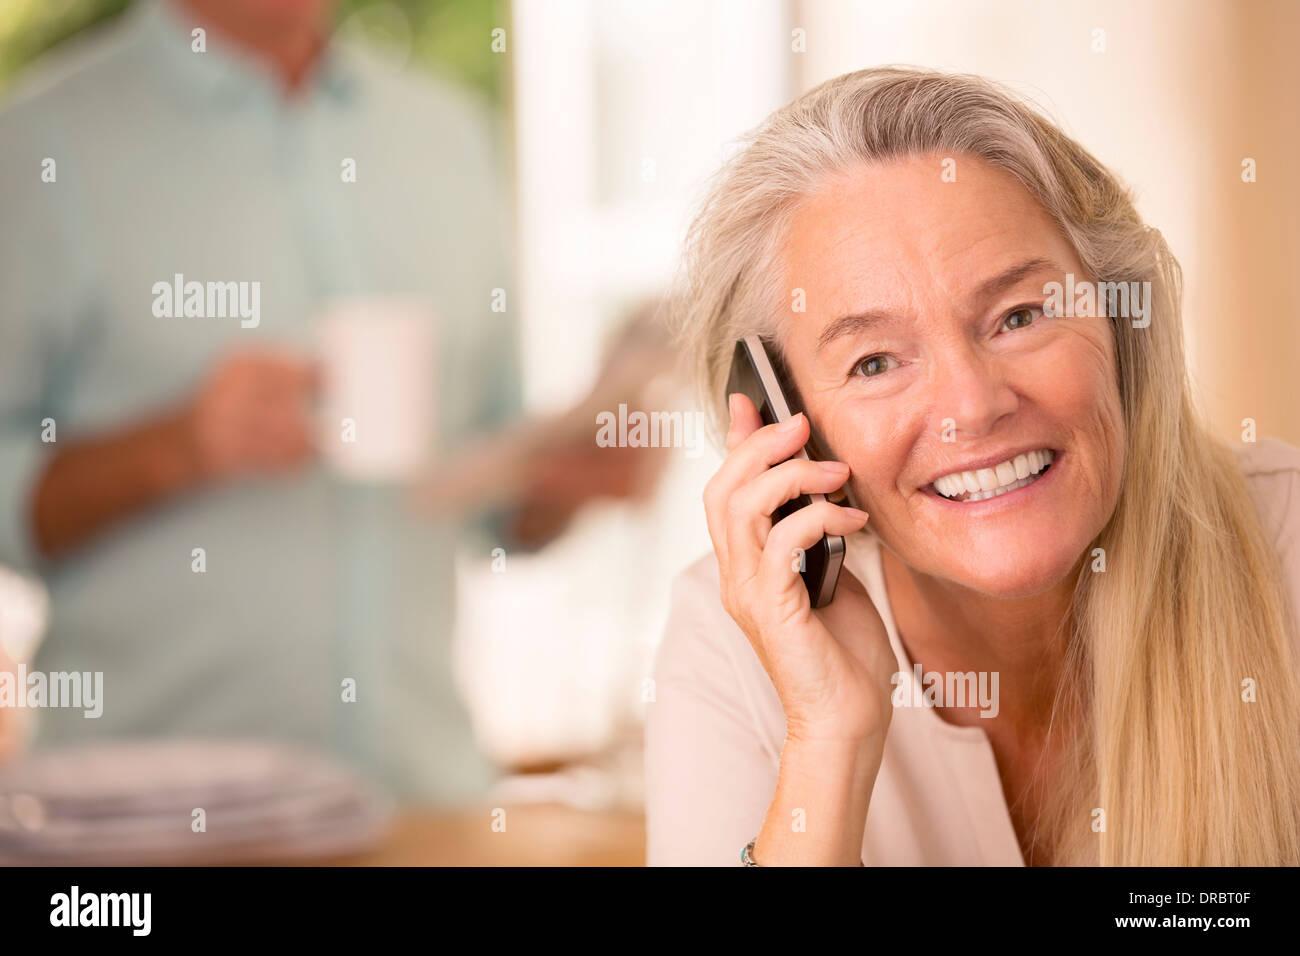 Senior woman talking on cell phone - Stock Image